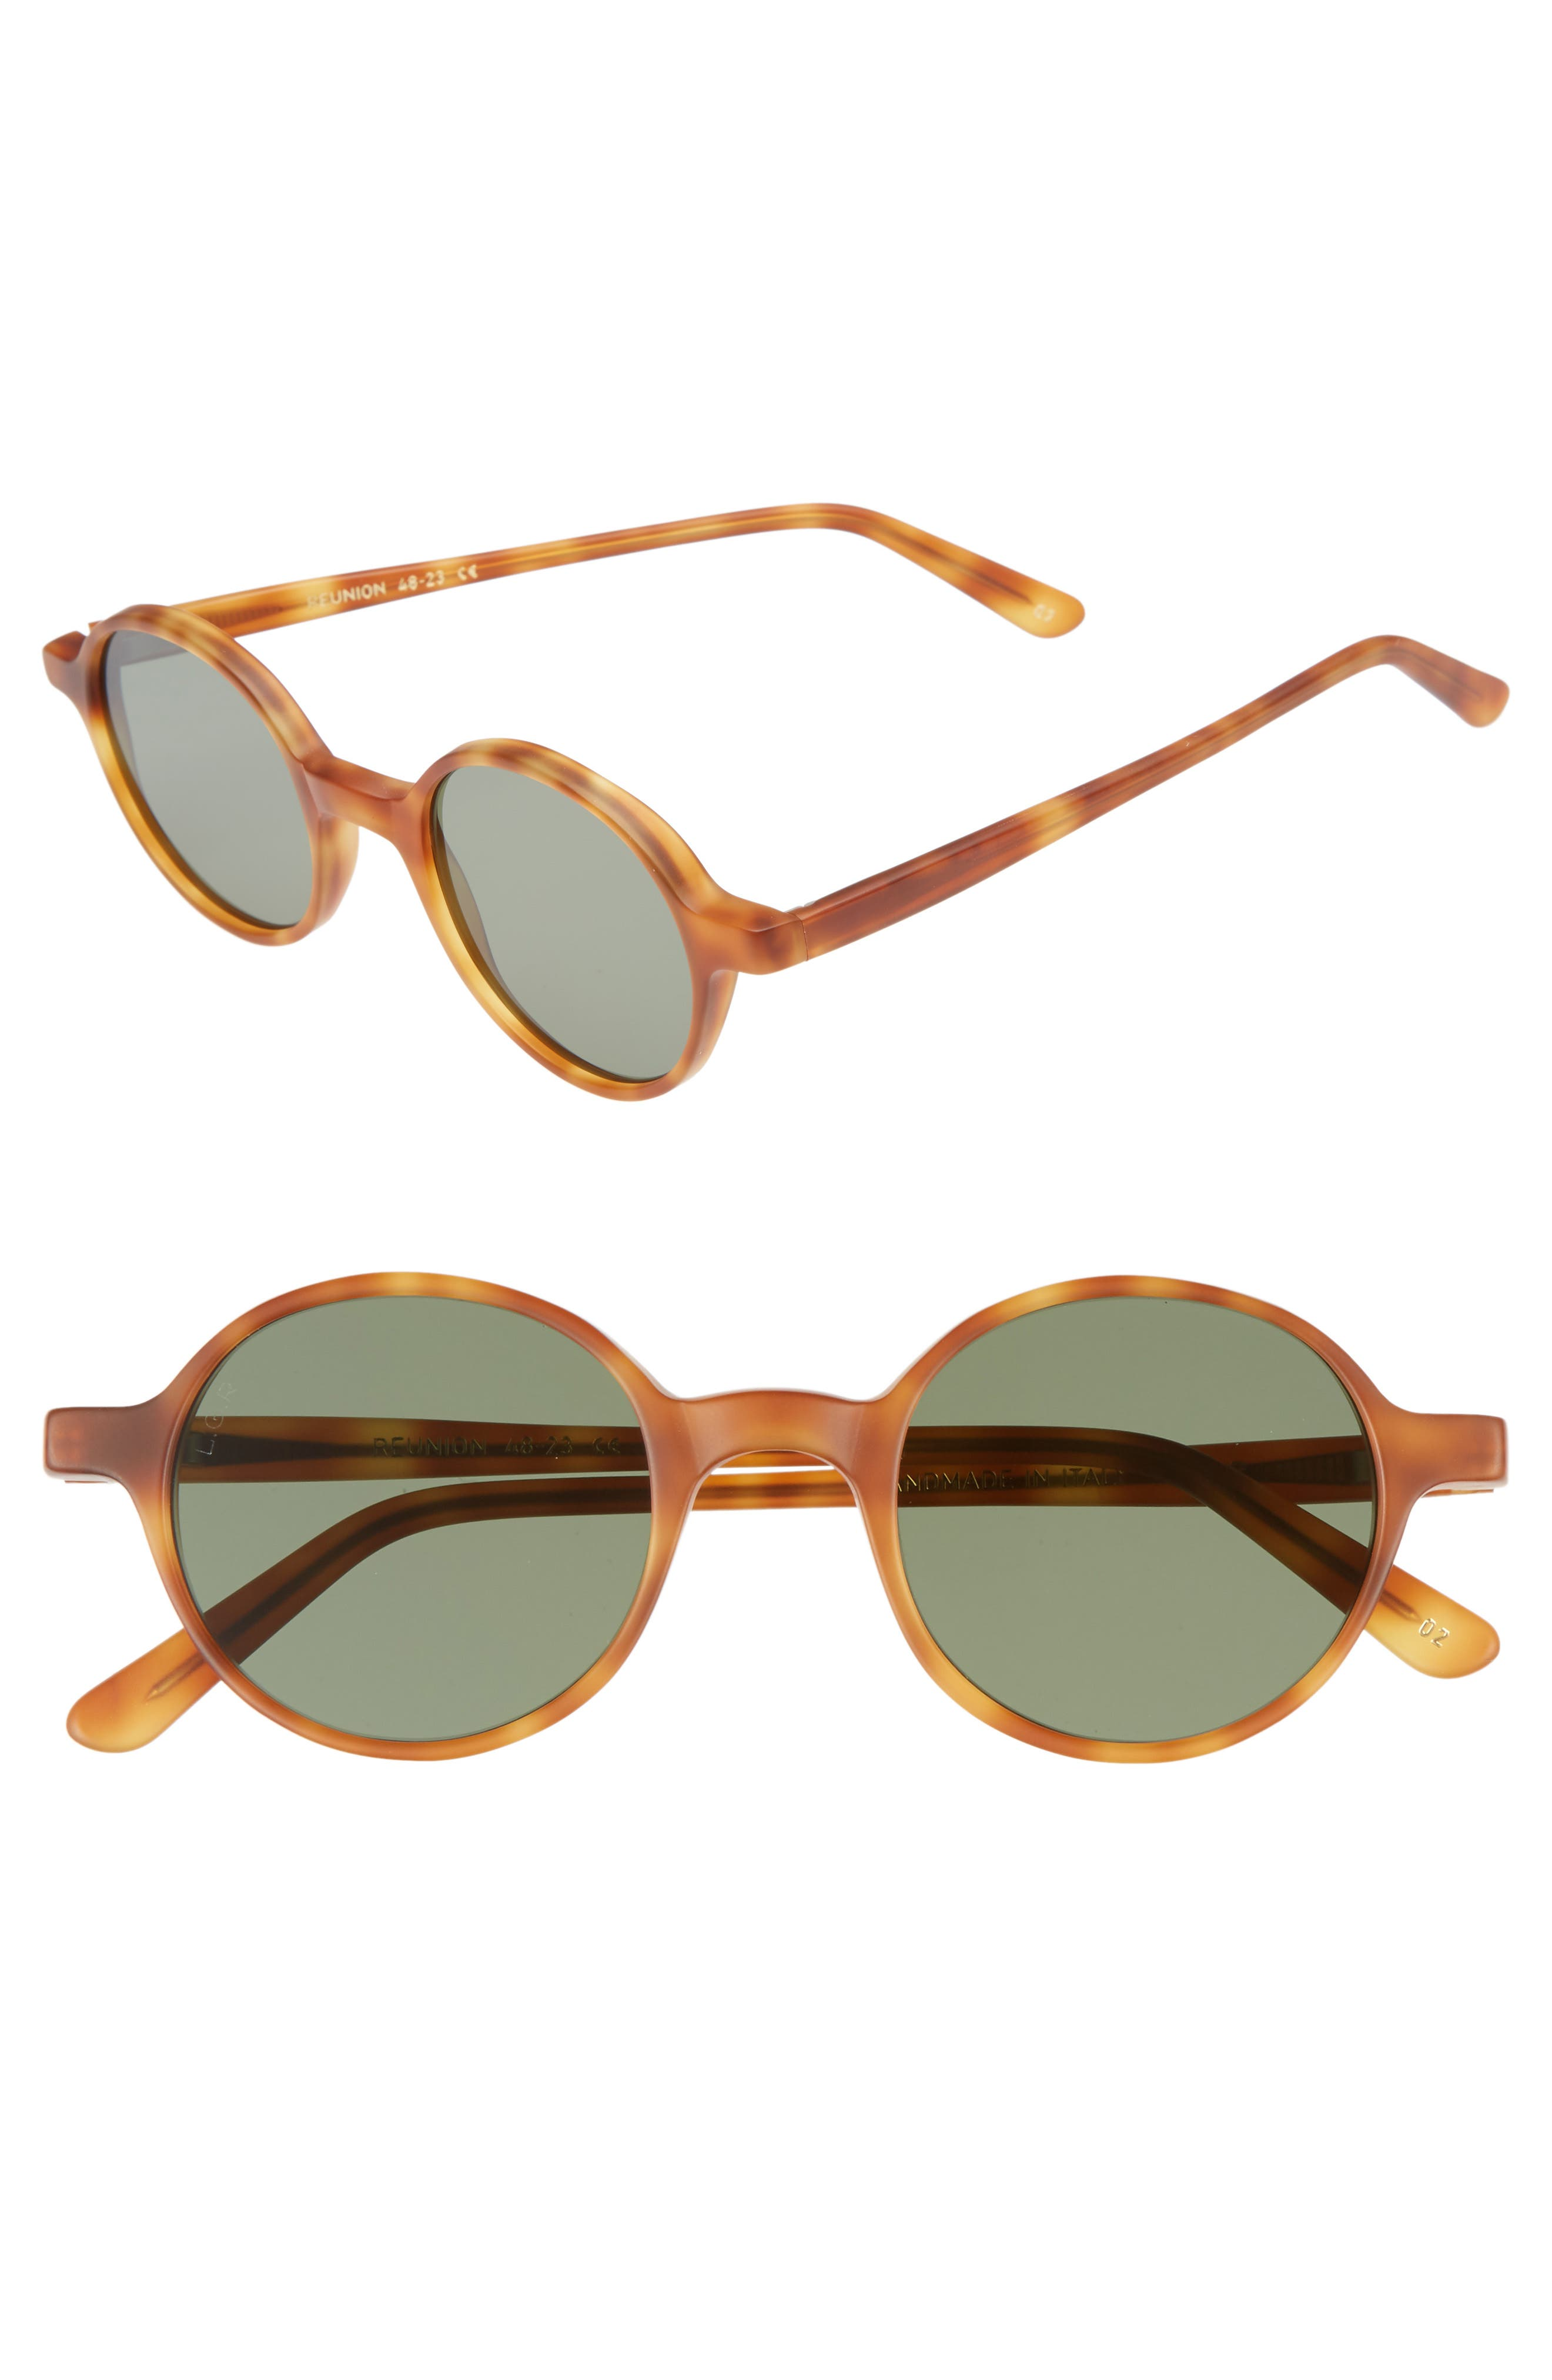 Reunion 48mm Sunglasses,                         Main,                         color, Havana Chiaro